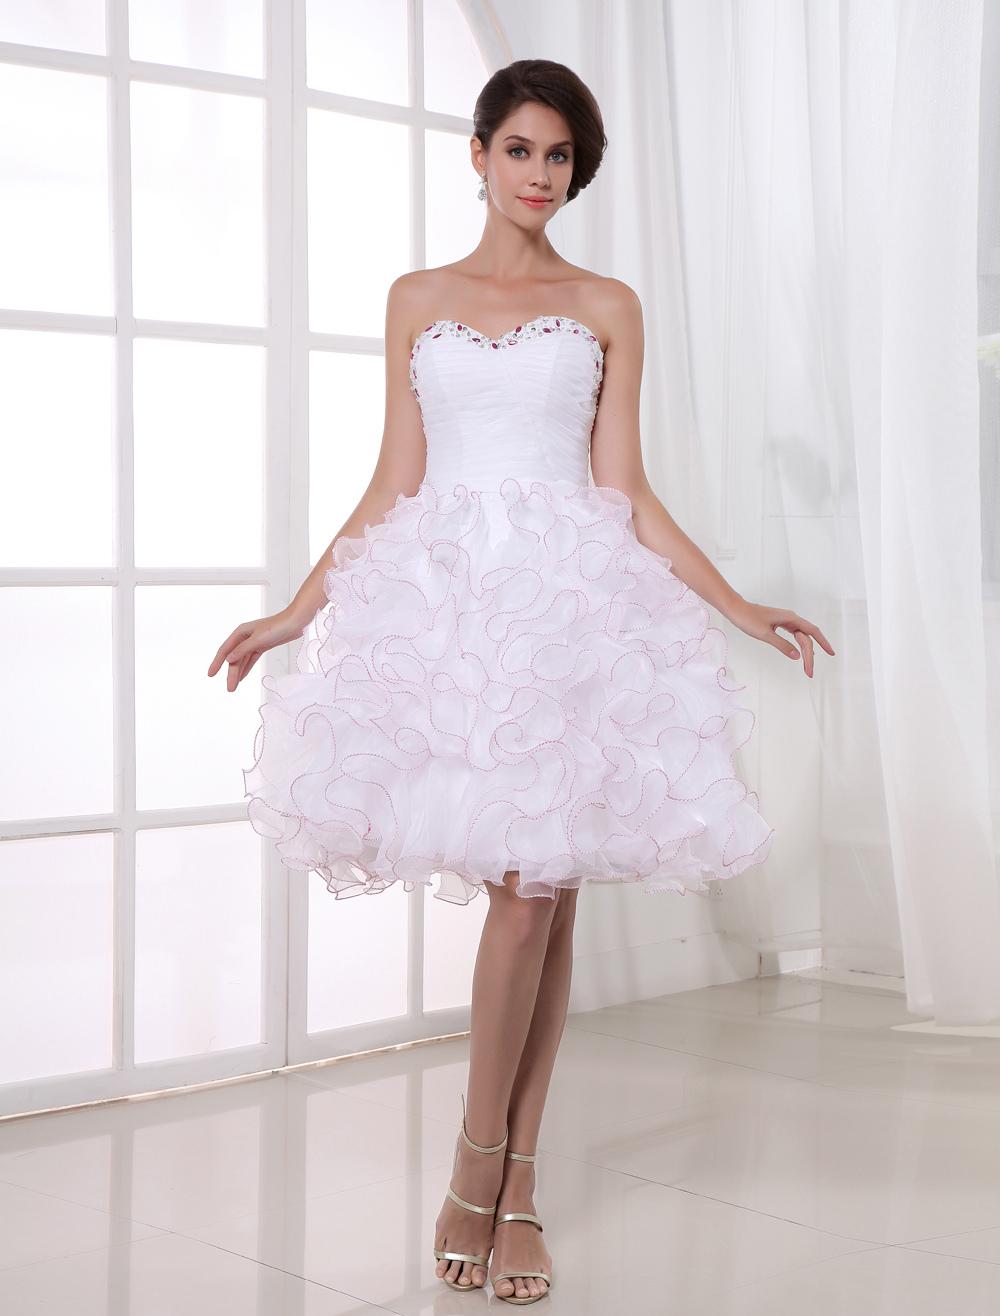 A-line White Organza Ruffles Knee-Length Women's Prom Dress (Wedding Prom Dresses) photo